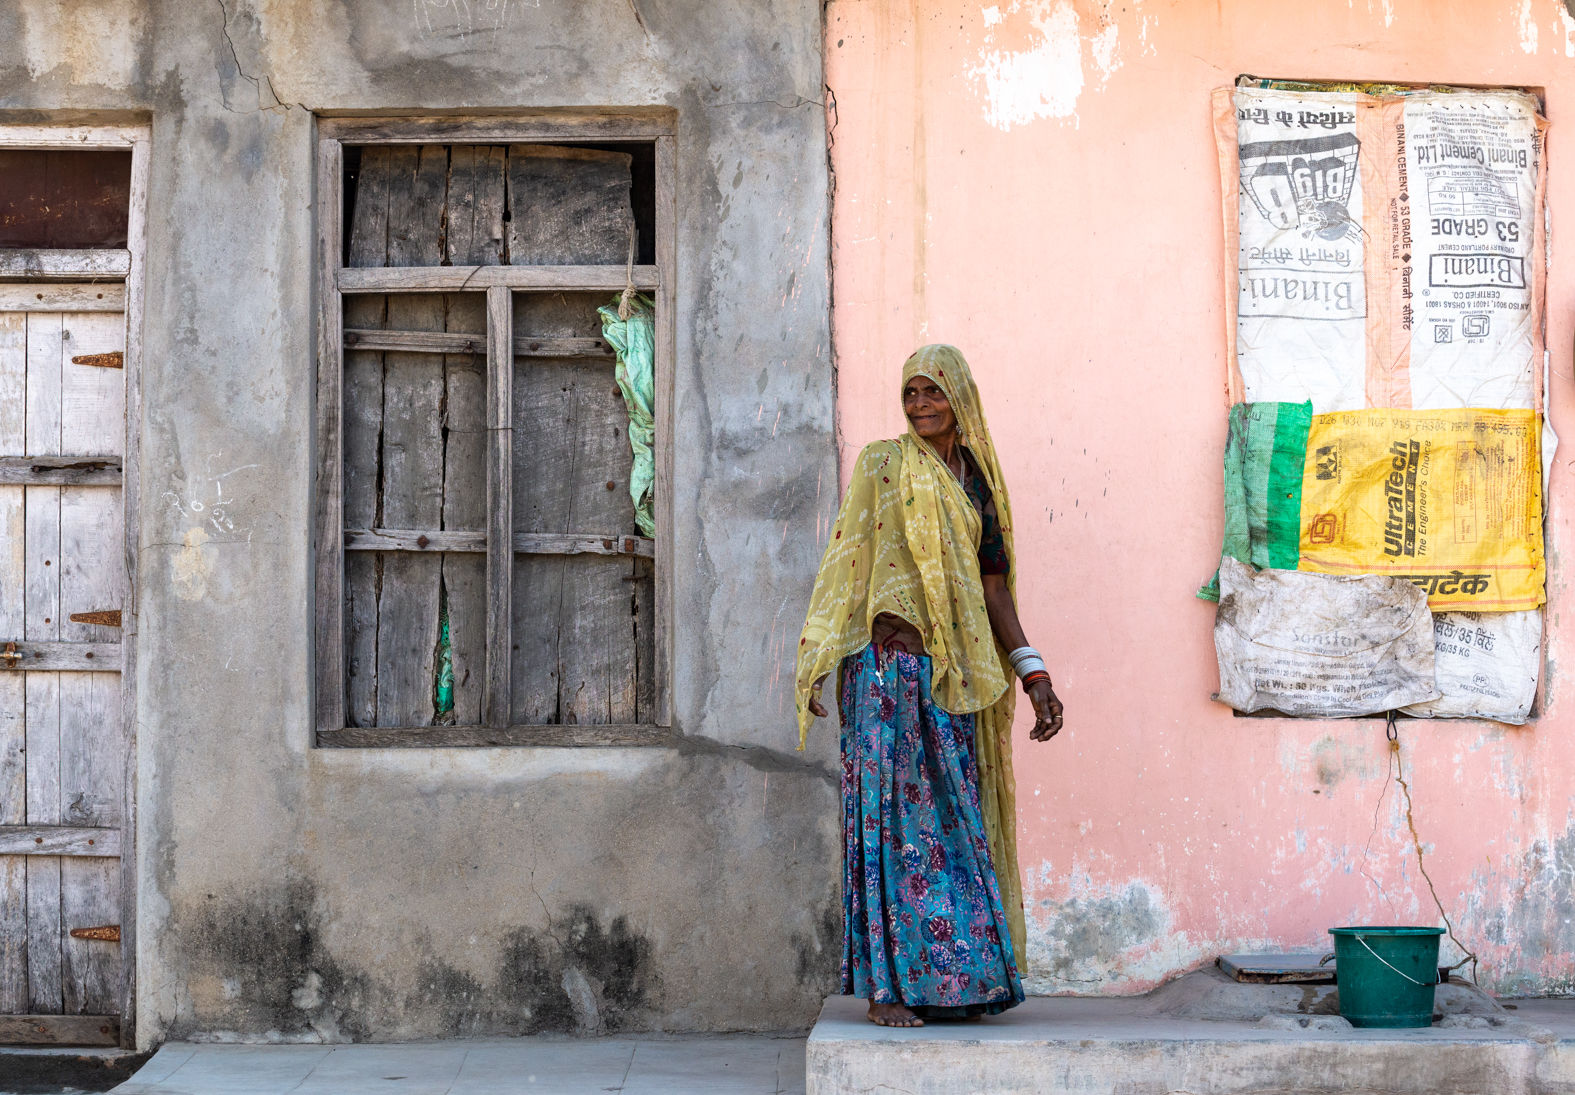 Chanoud, Rajasthan